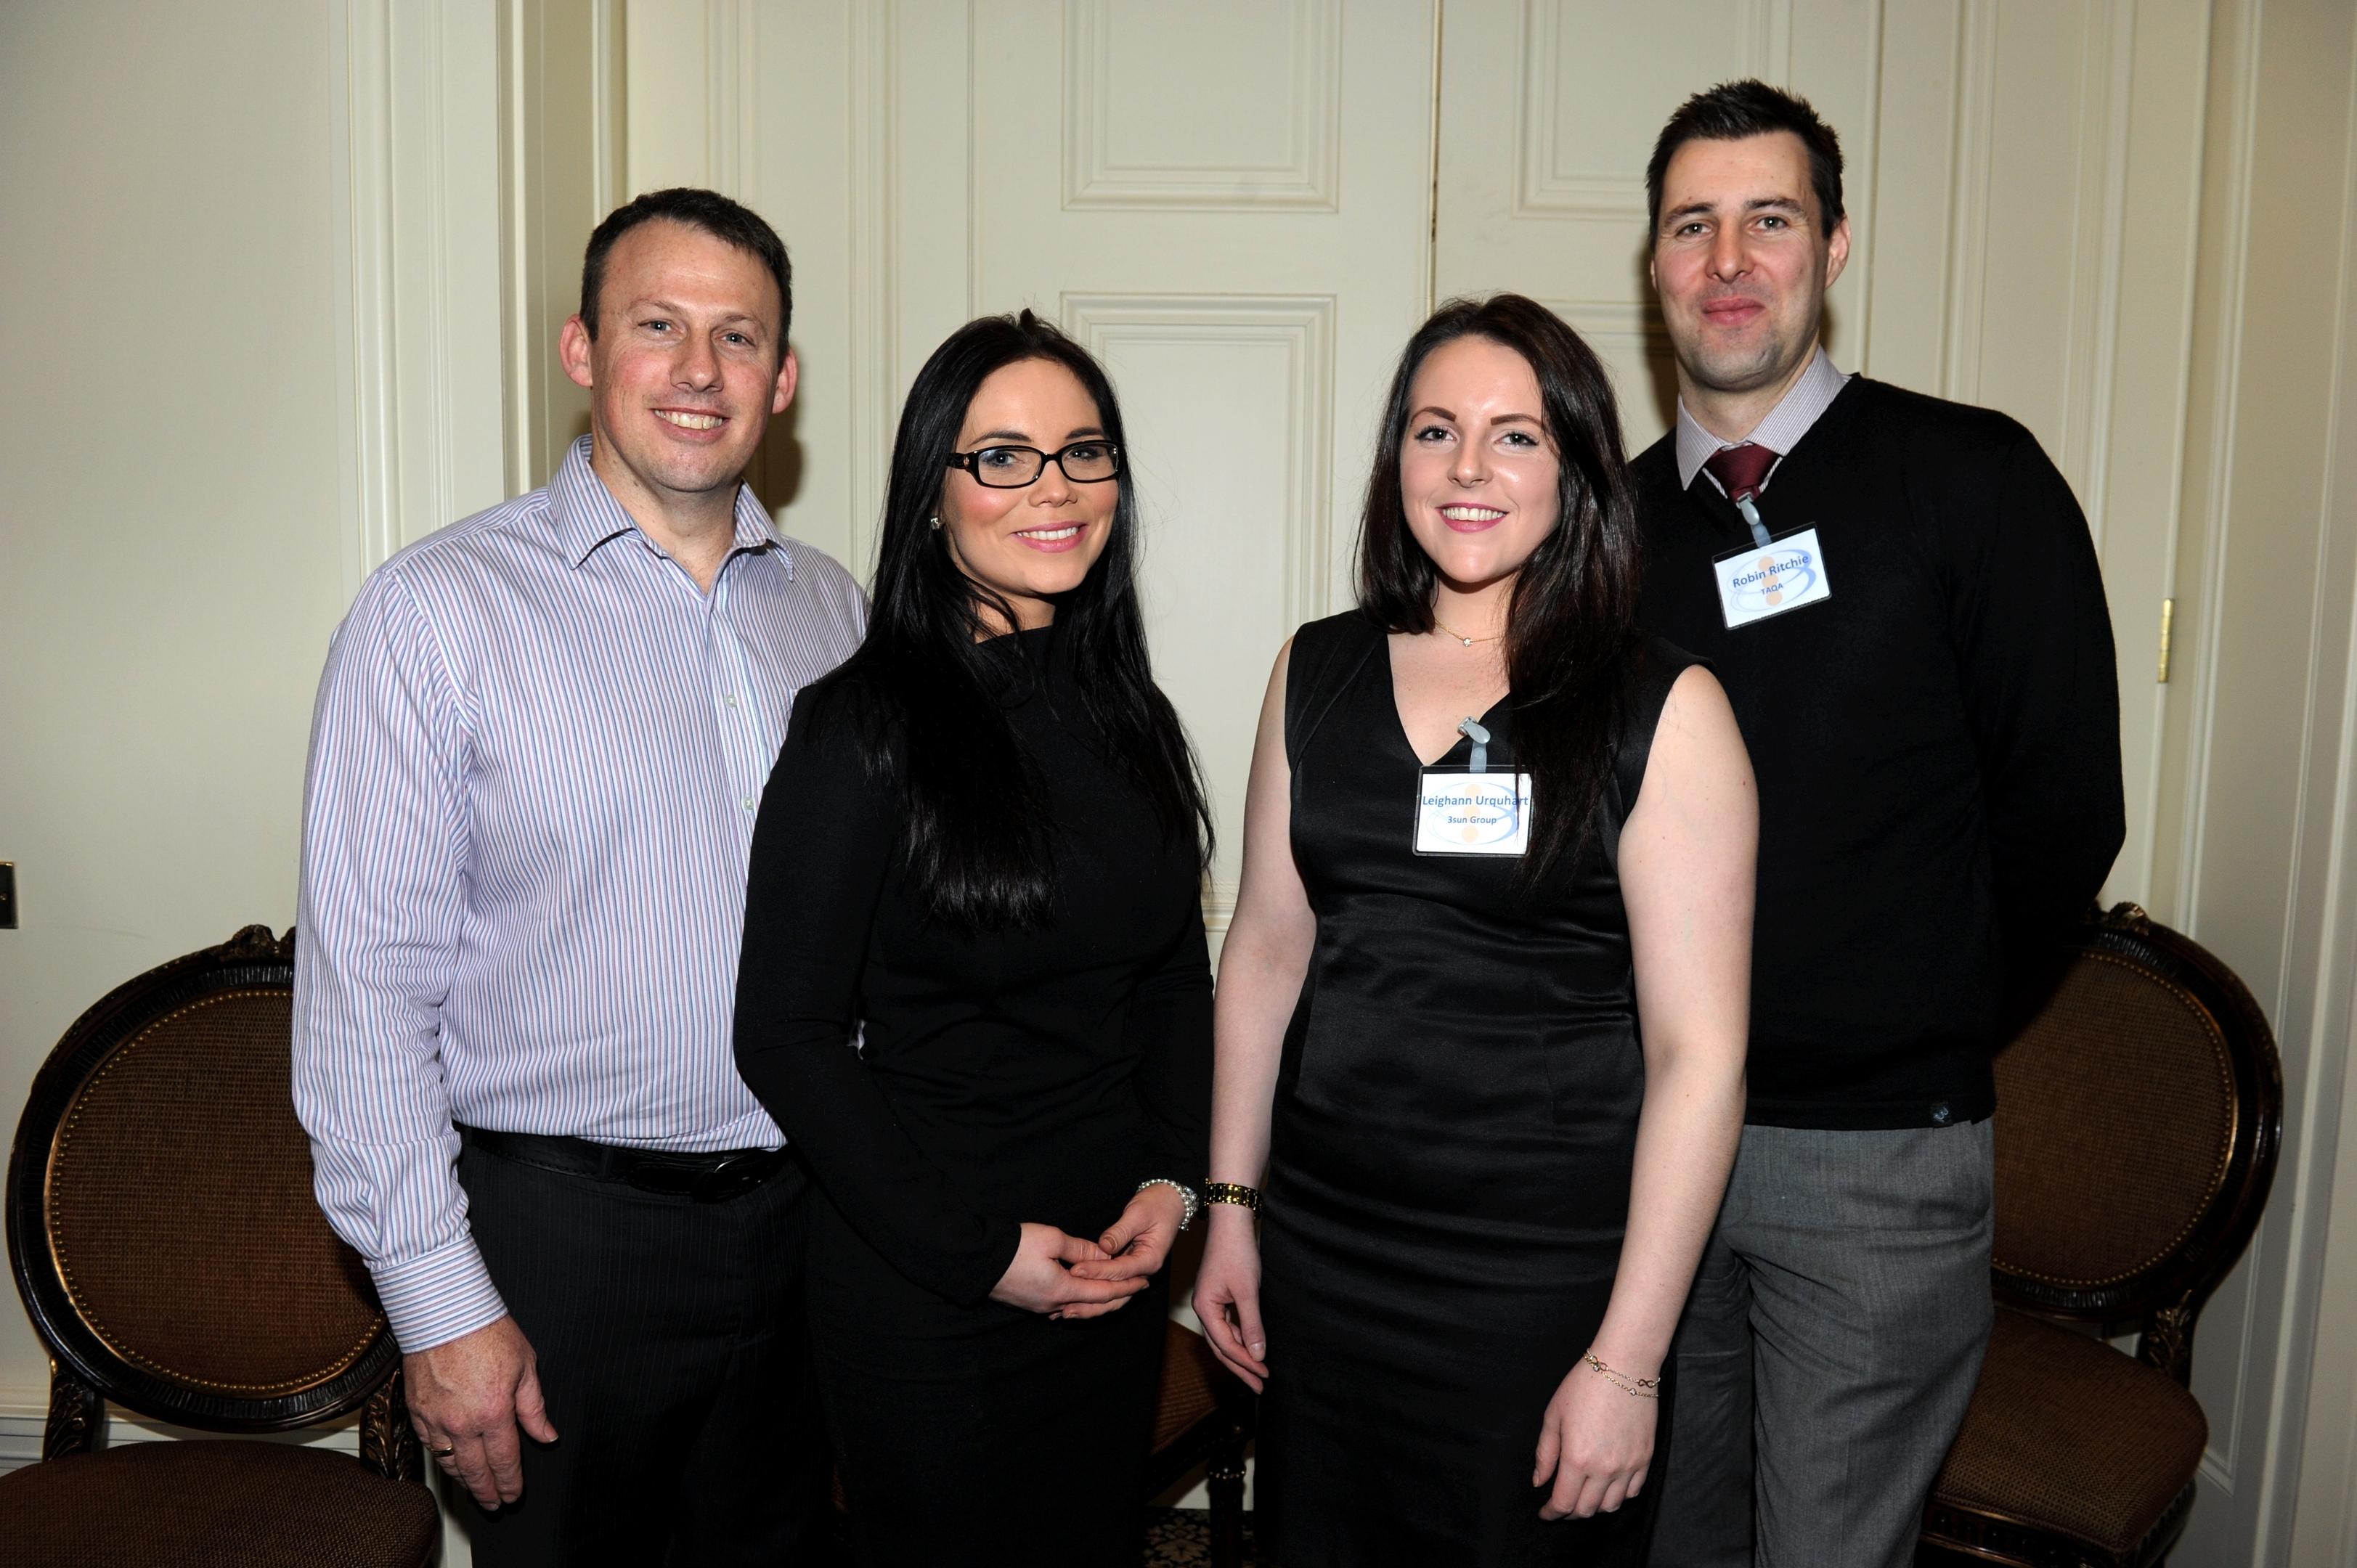 (L-R) Tim Harrison, Kim Ironside, Leighann Urquhart and Robin Ritchie